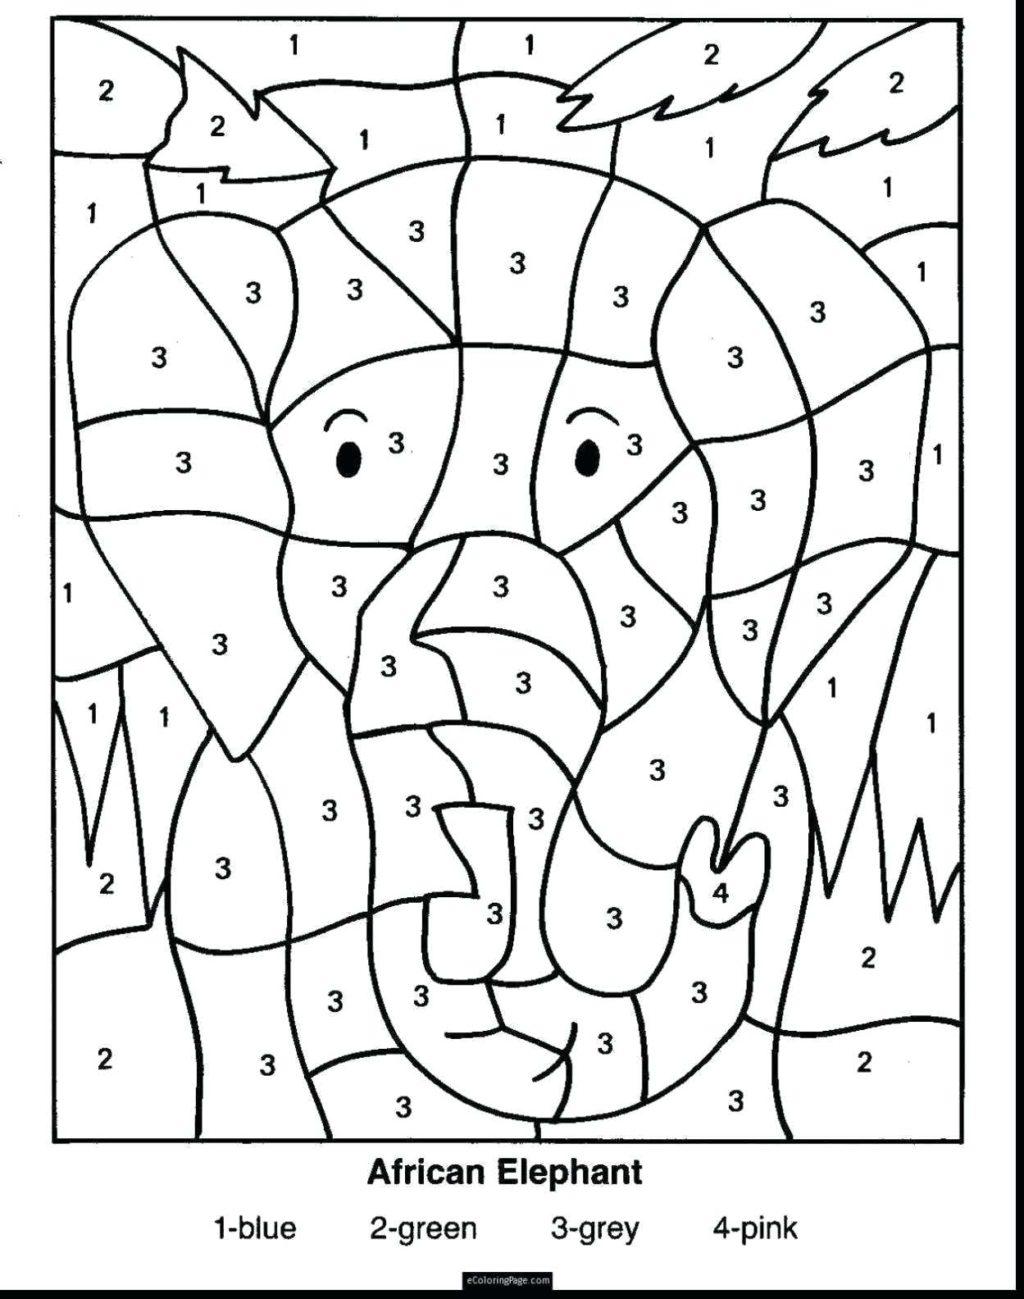 Worksheet ~ Reading Worskheets Multiplication Coloring